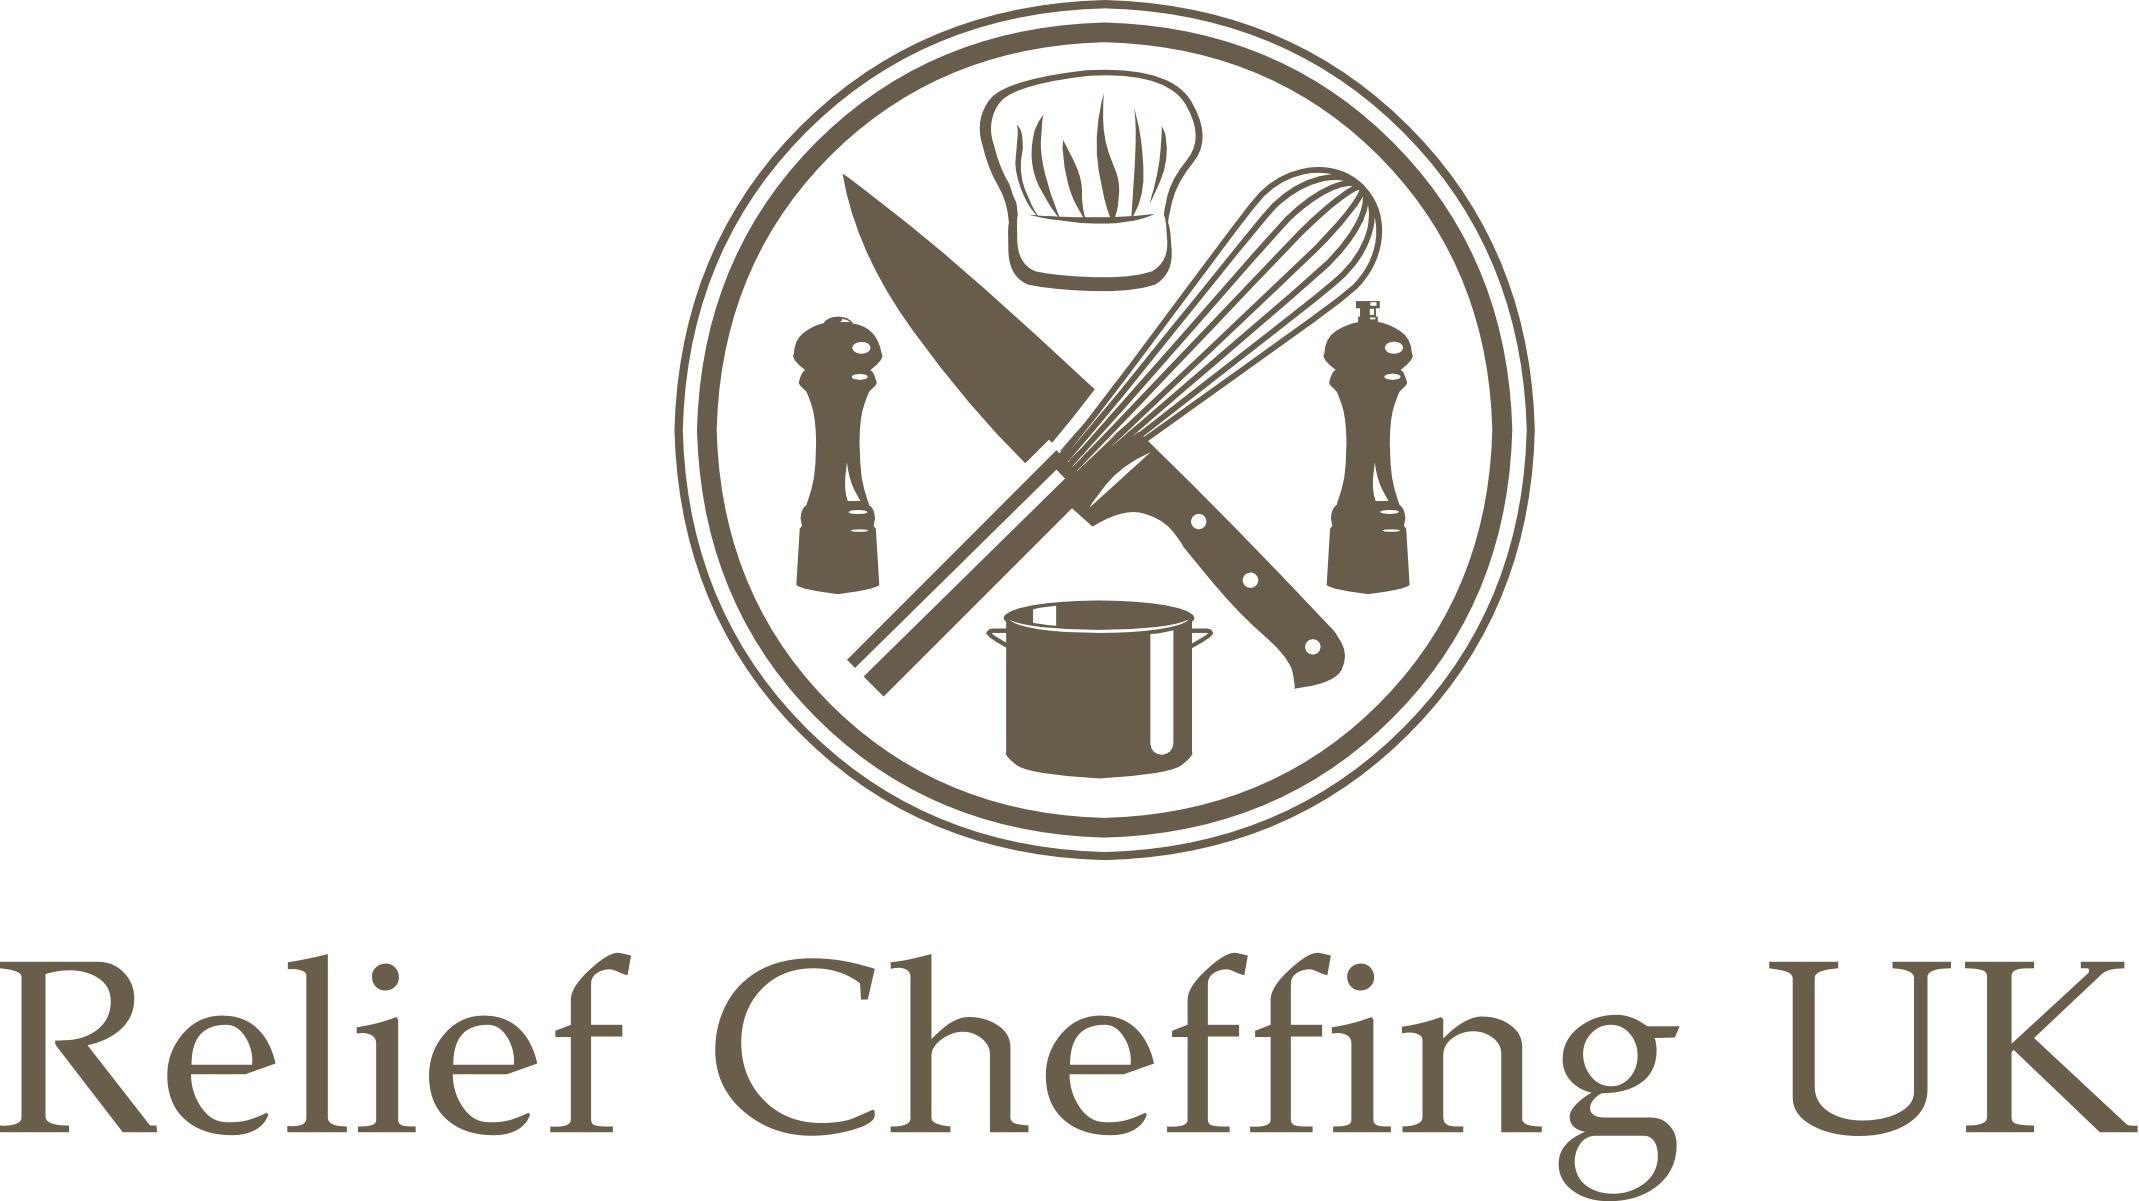 Relief Cheffing UK Ltd - Tel: 01332 803860 - Listing in Derby